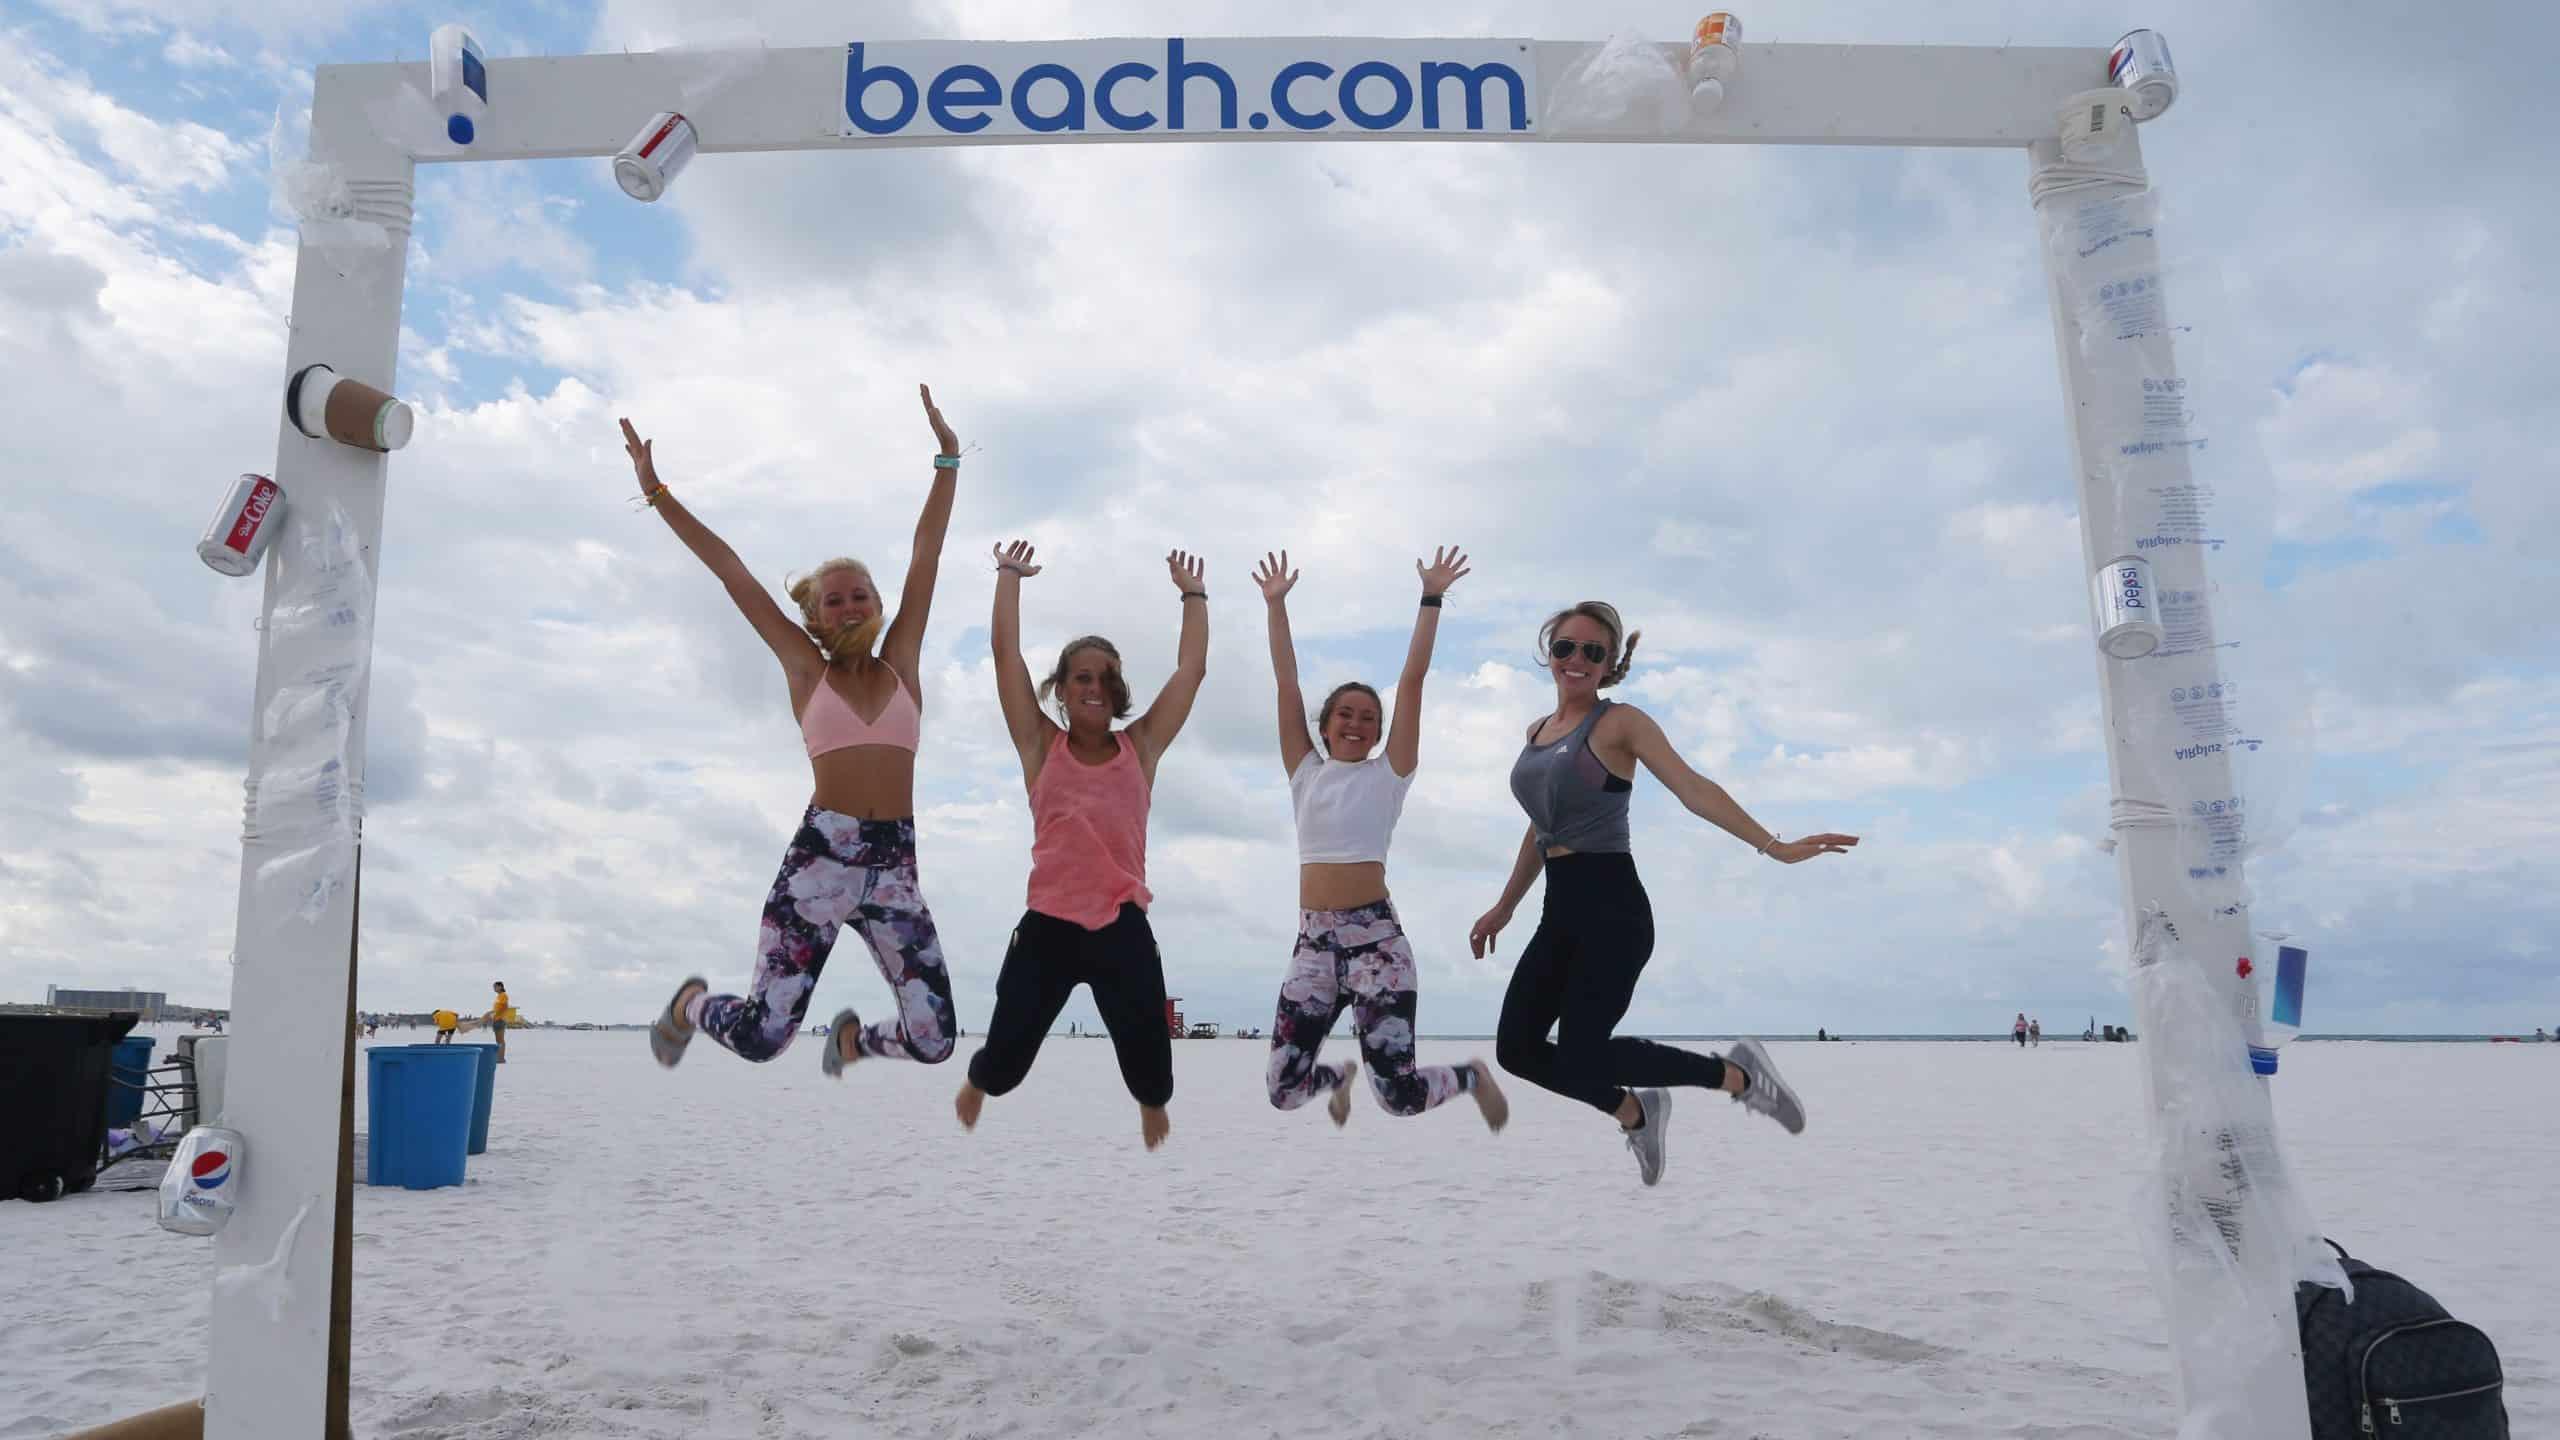 beach.com world oceans day beach cleanup event